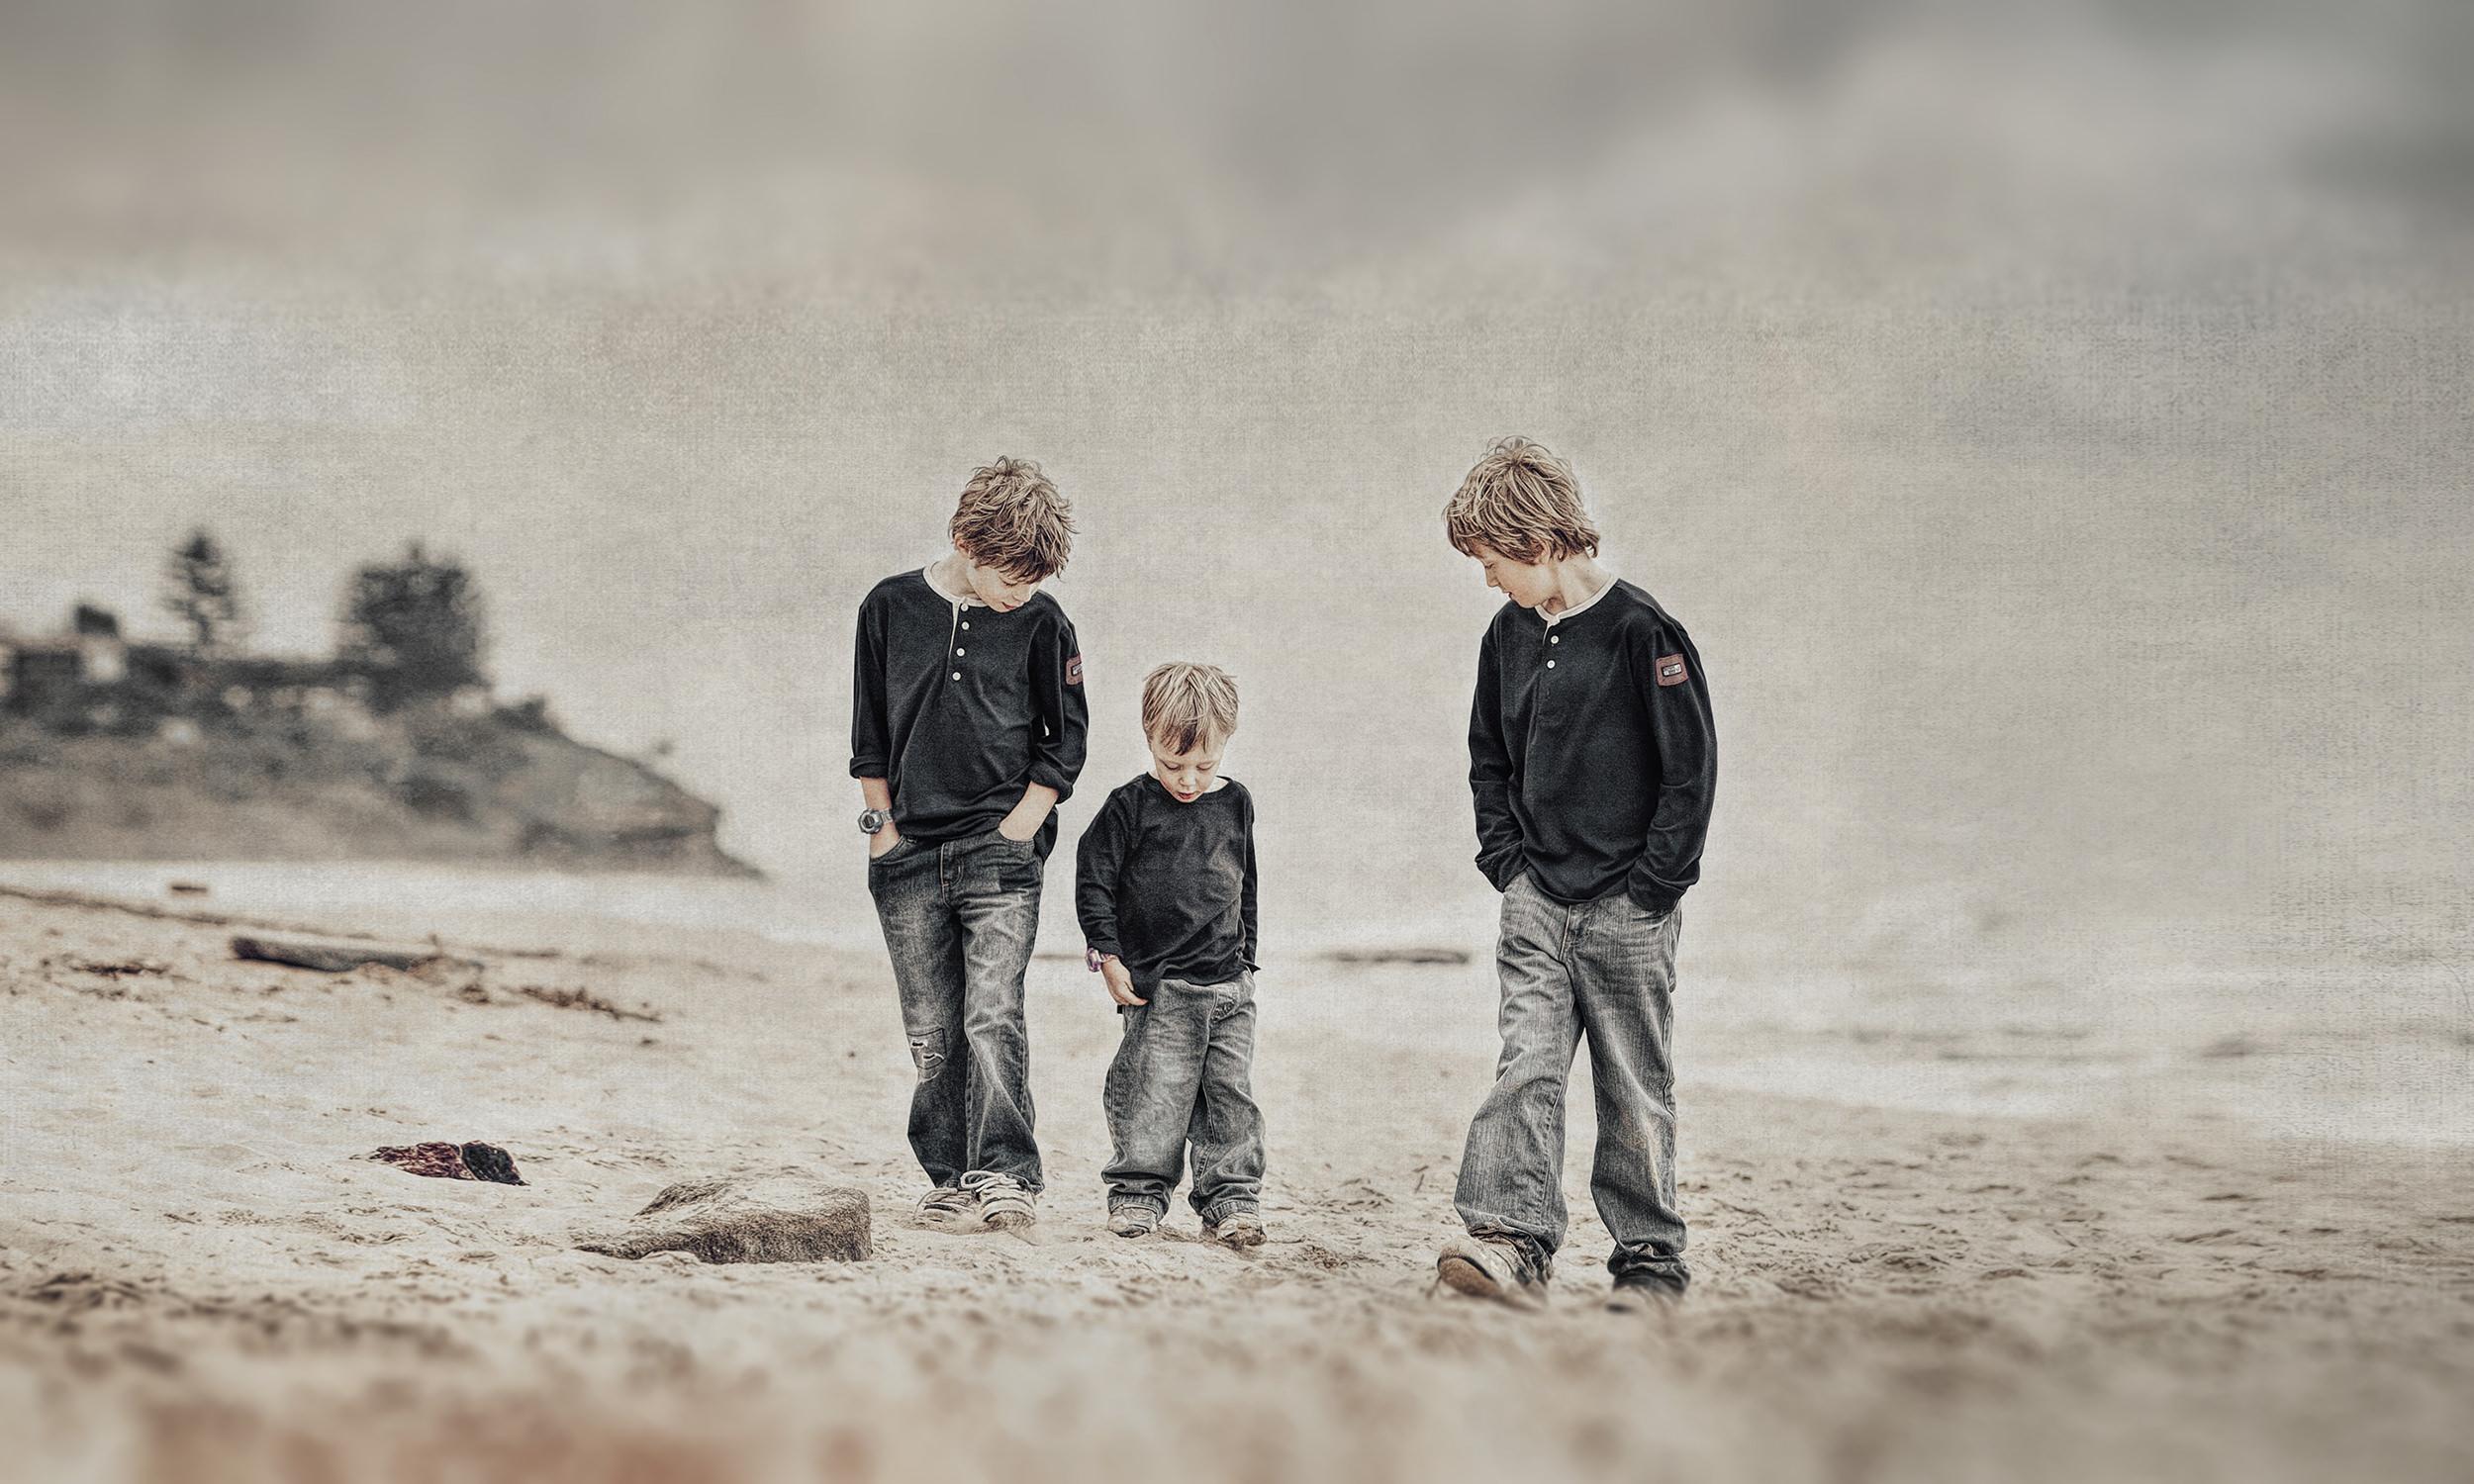 Gallery-boys-beach-portrait-natural-light-portrait.jpg